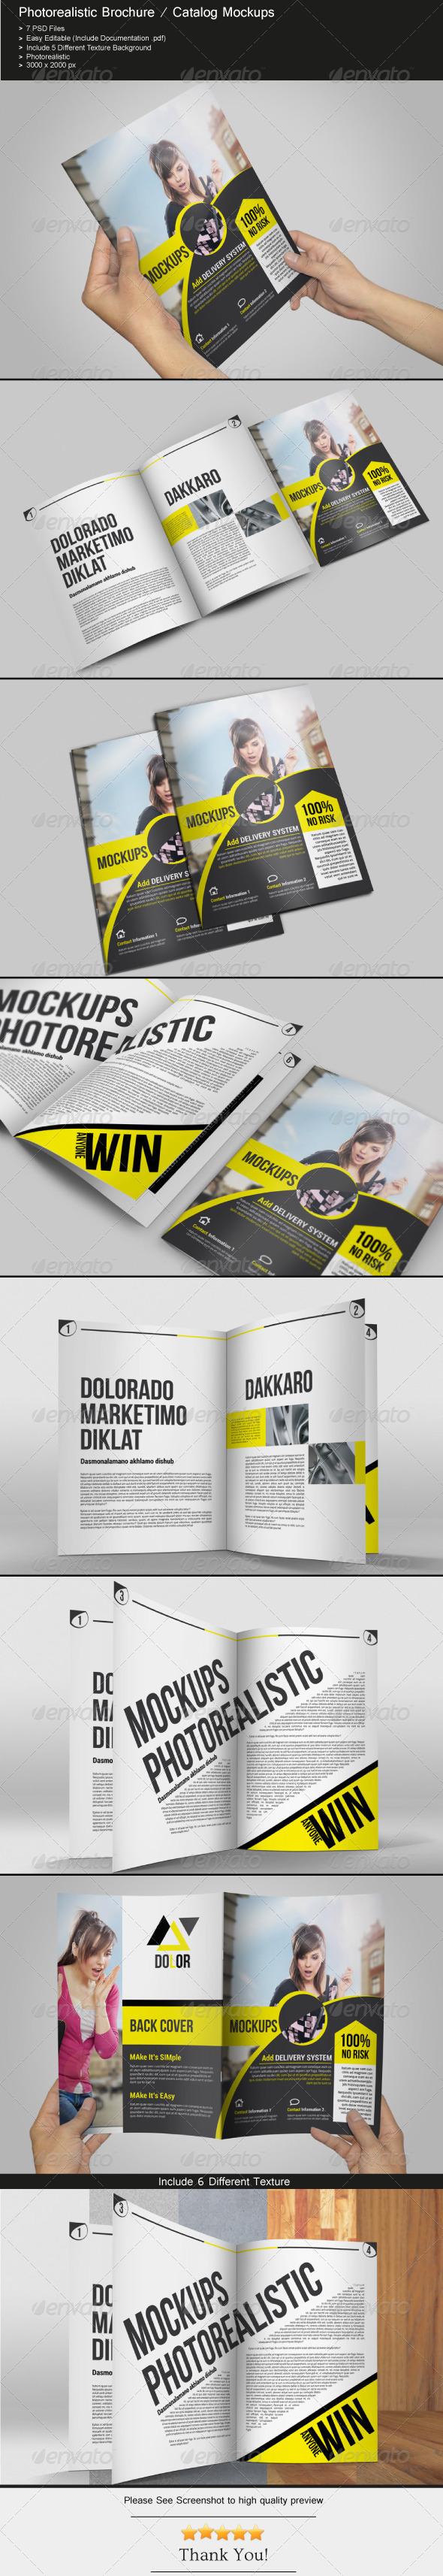 GraphicRiver Brochure Catalog Mockups 6757622